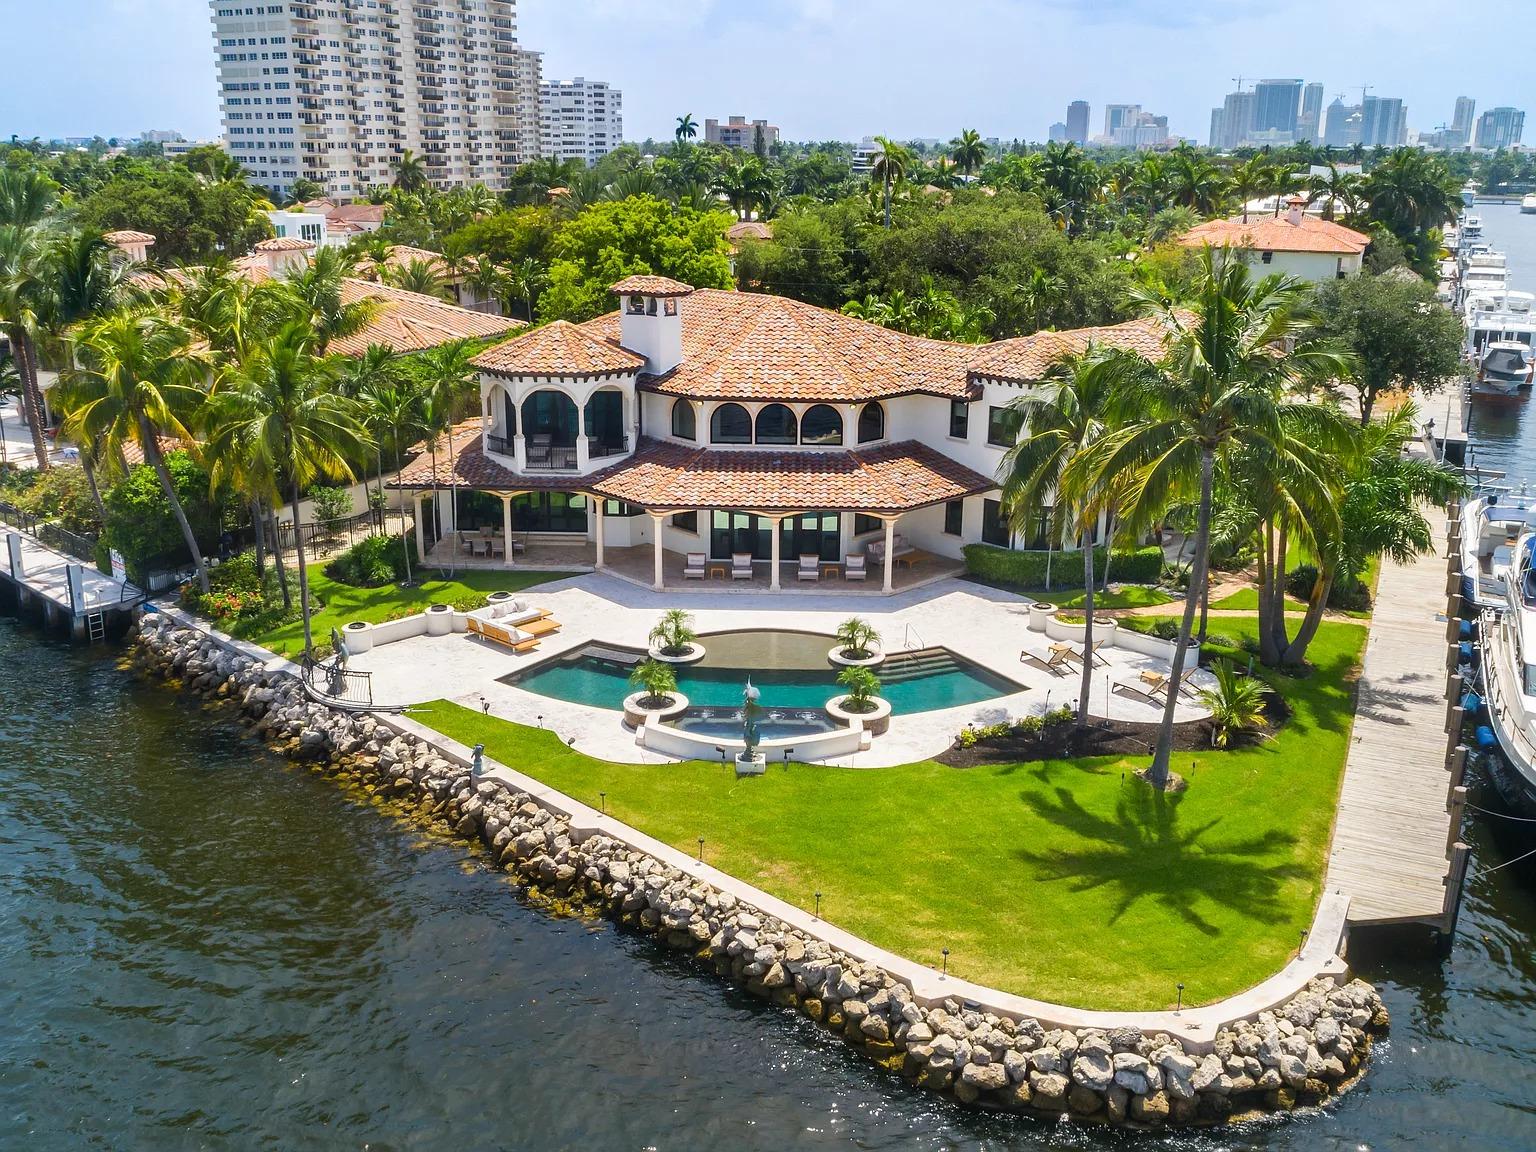 2623 Delmar Pl,Fort Lauderdale, FL 33301